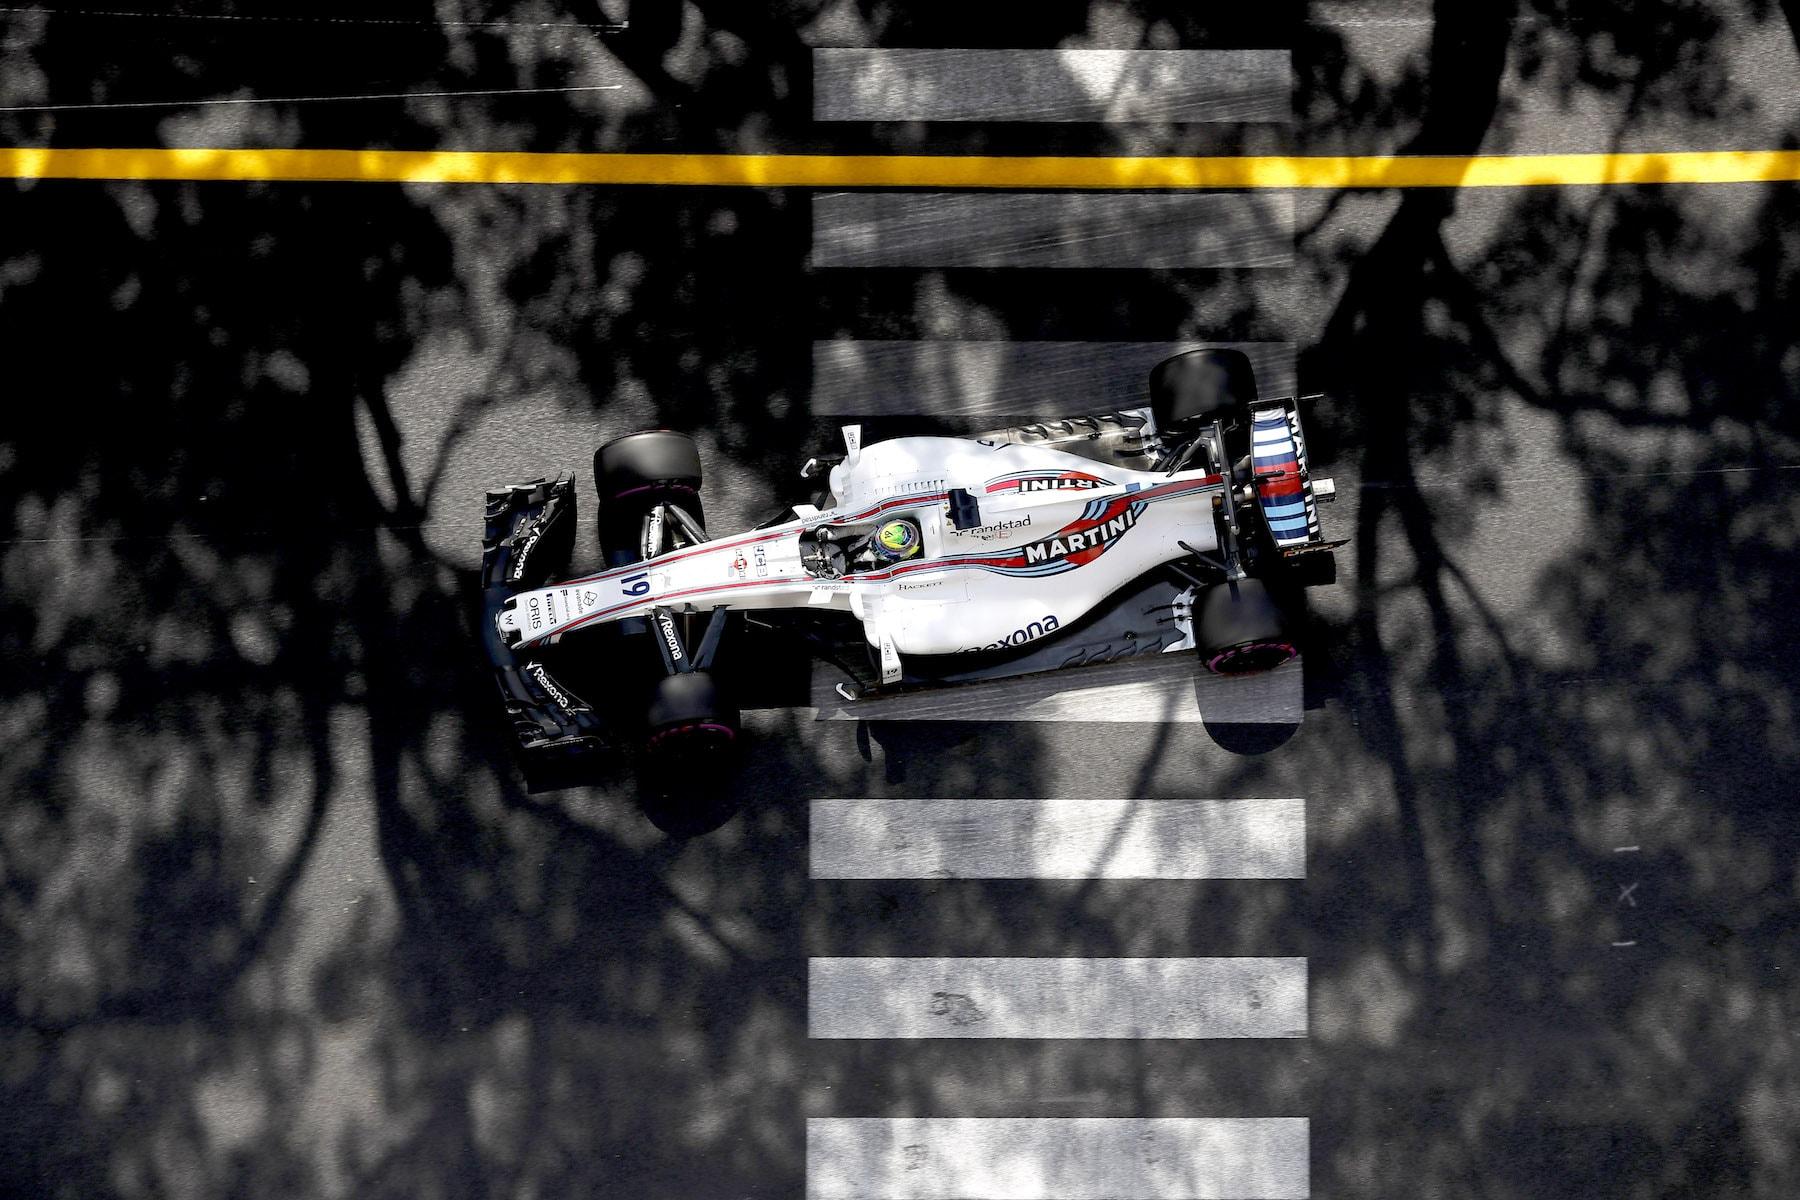 2017 Felipe Massa | Williams FW40 | 2017 Monaco GP Q1 1 copy.JPG